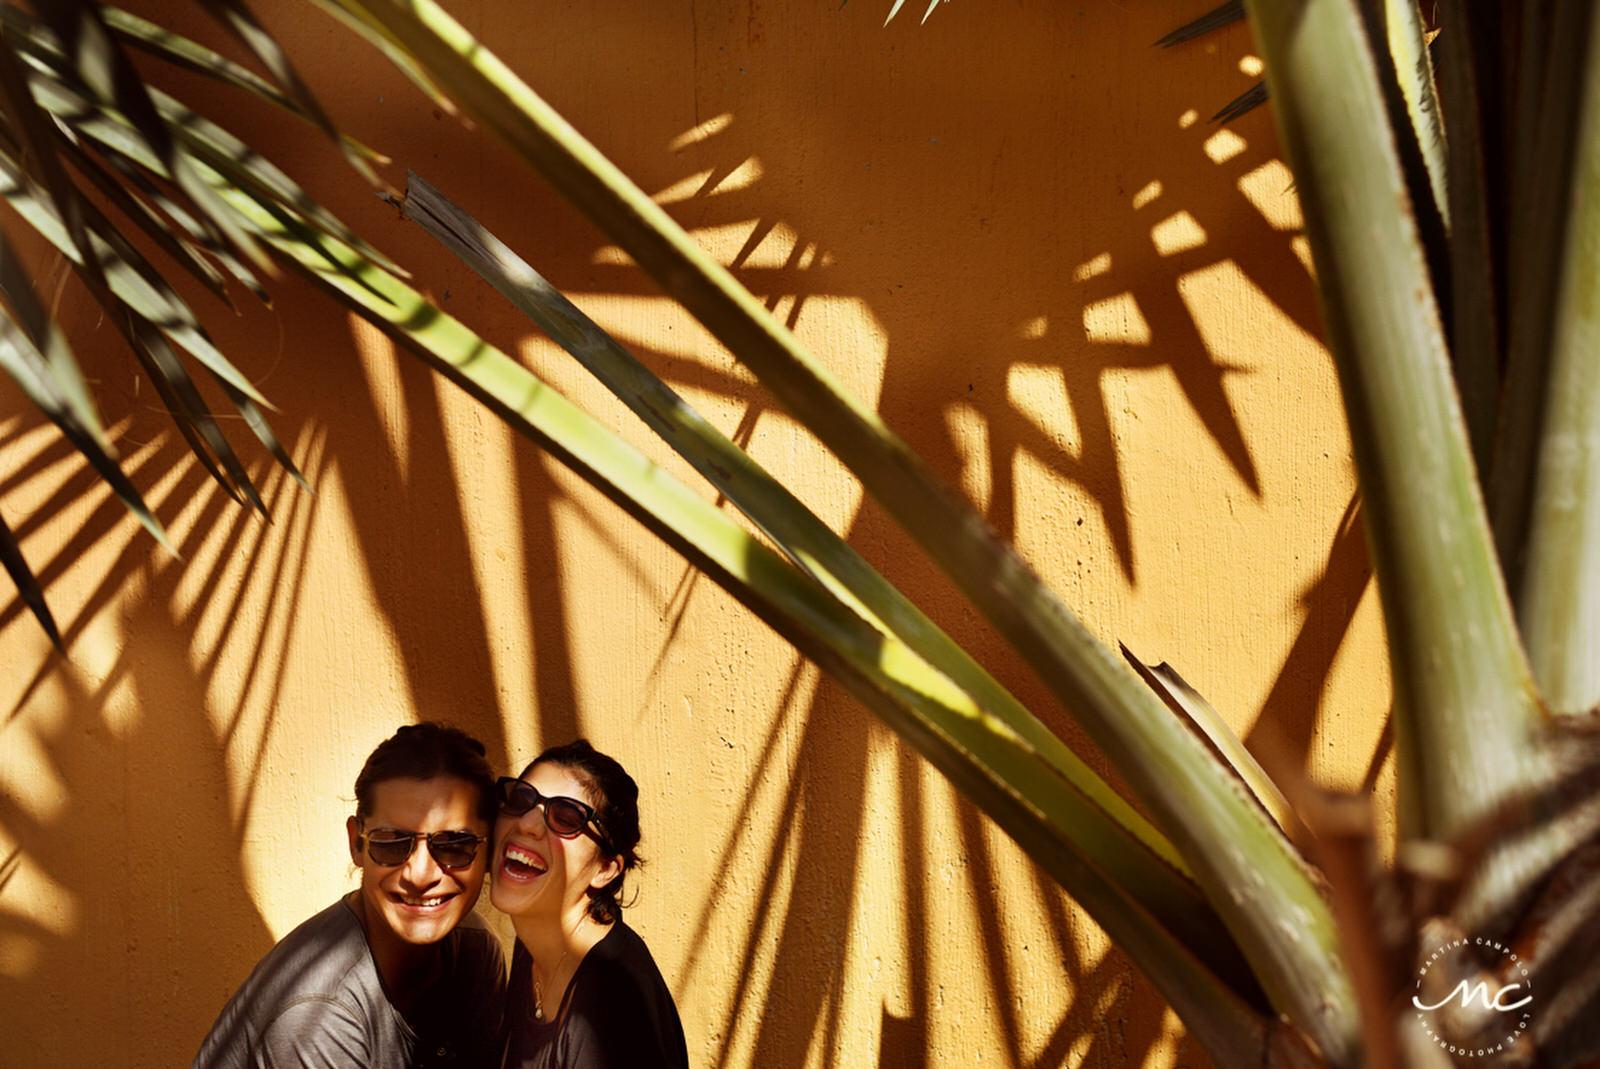 Couple dance in front of colonial church in Merida, Yucatan, Mexico. Martina Campolo Photography